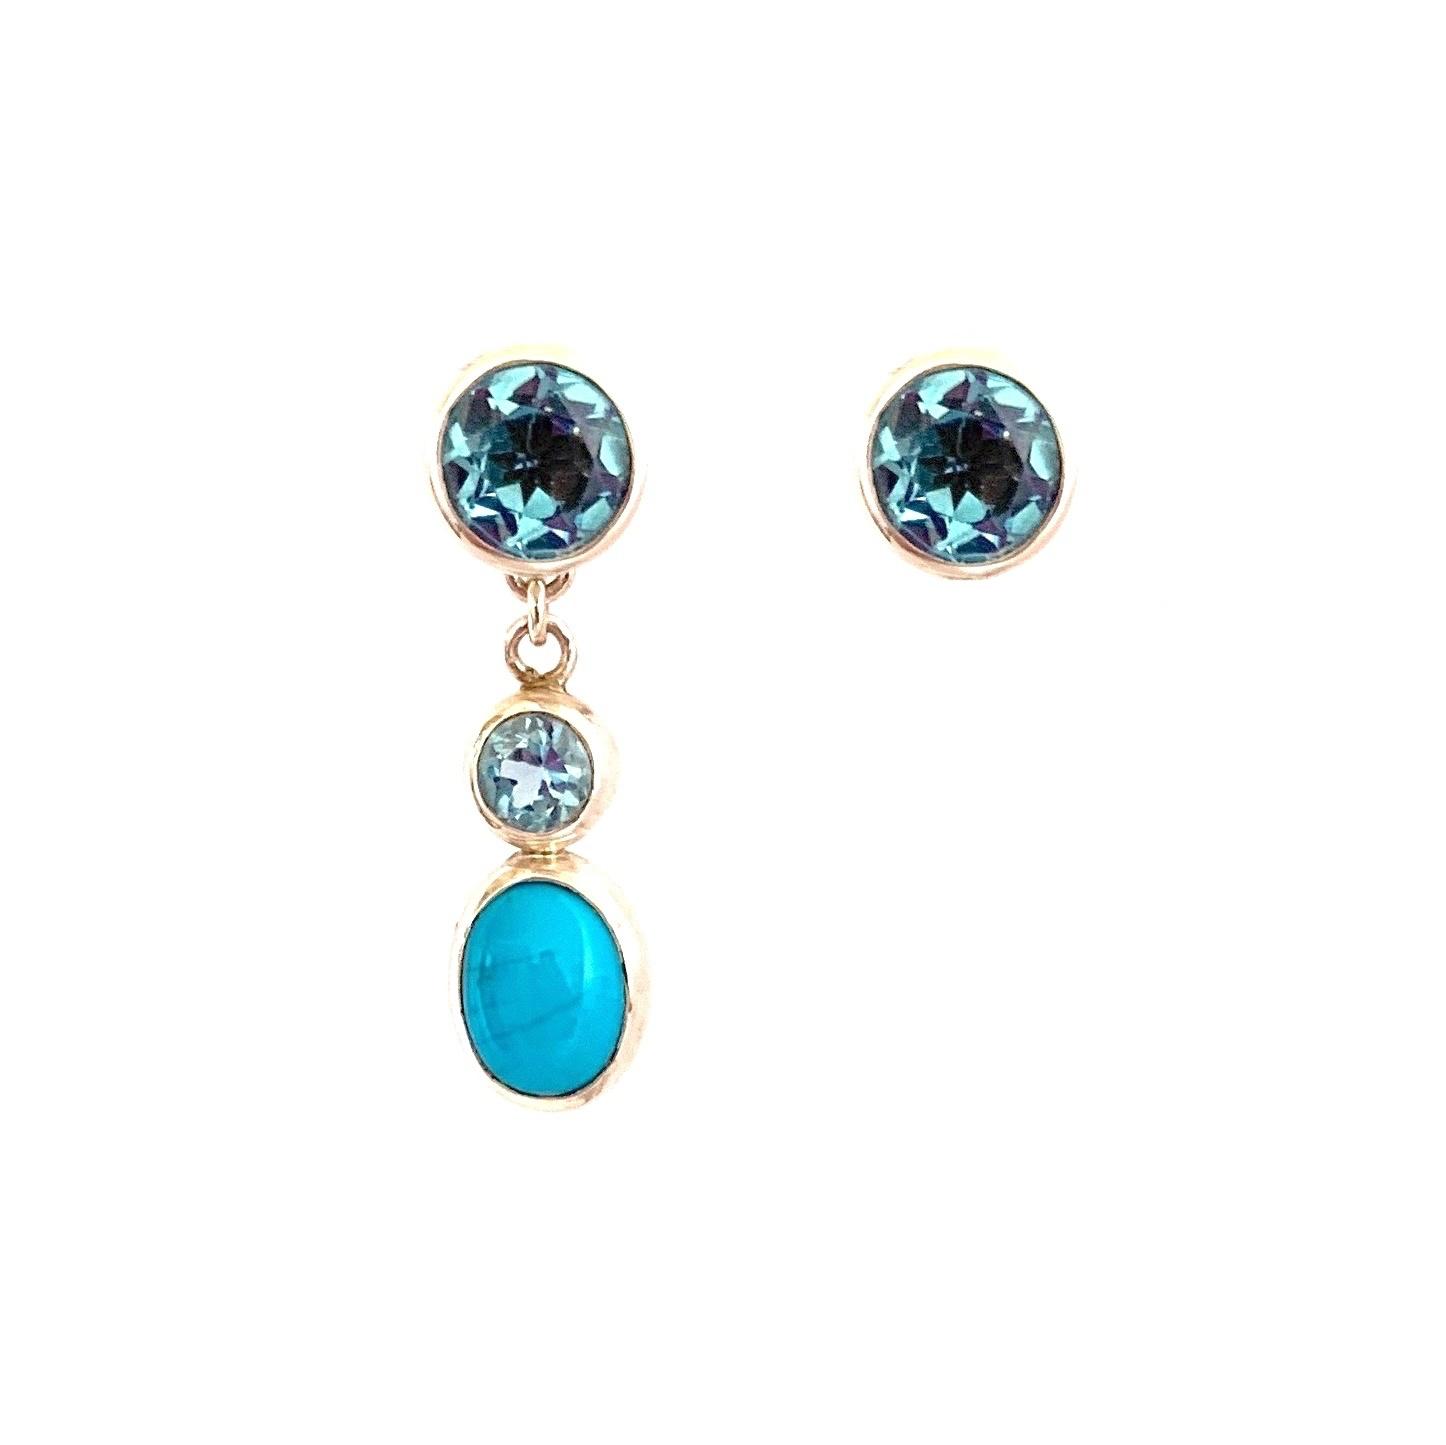 Changeable oorbellen Changeable earrings turquoise and topaz